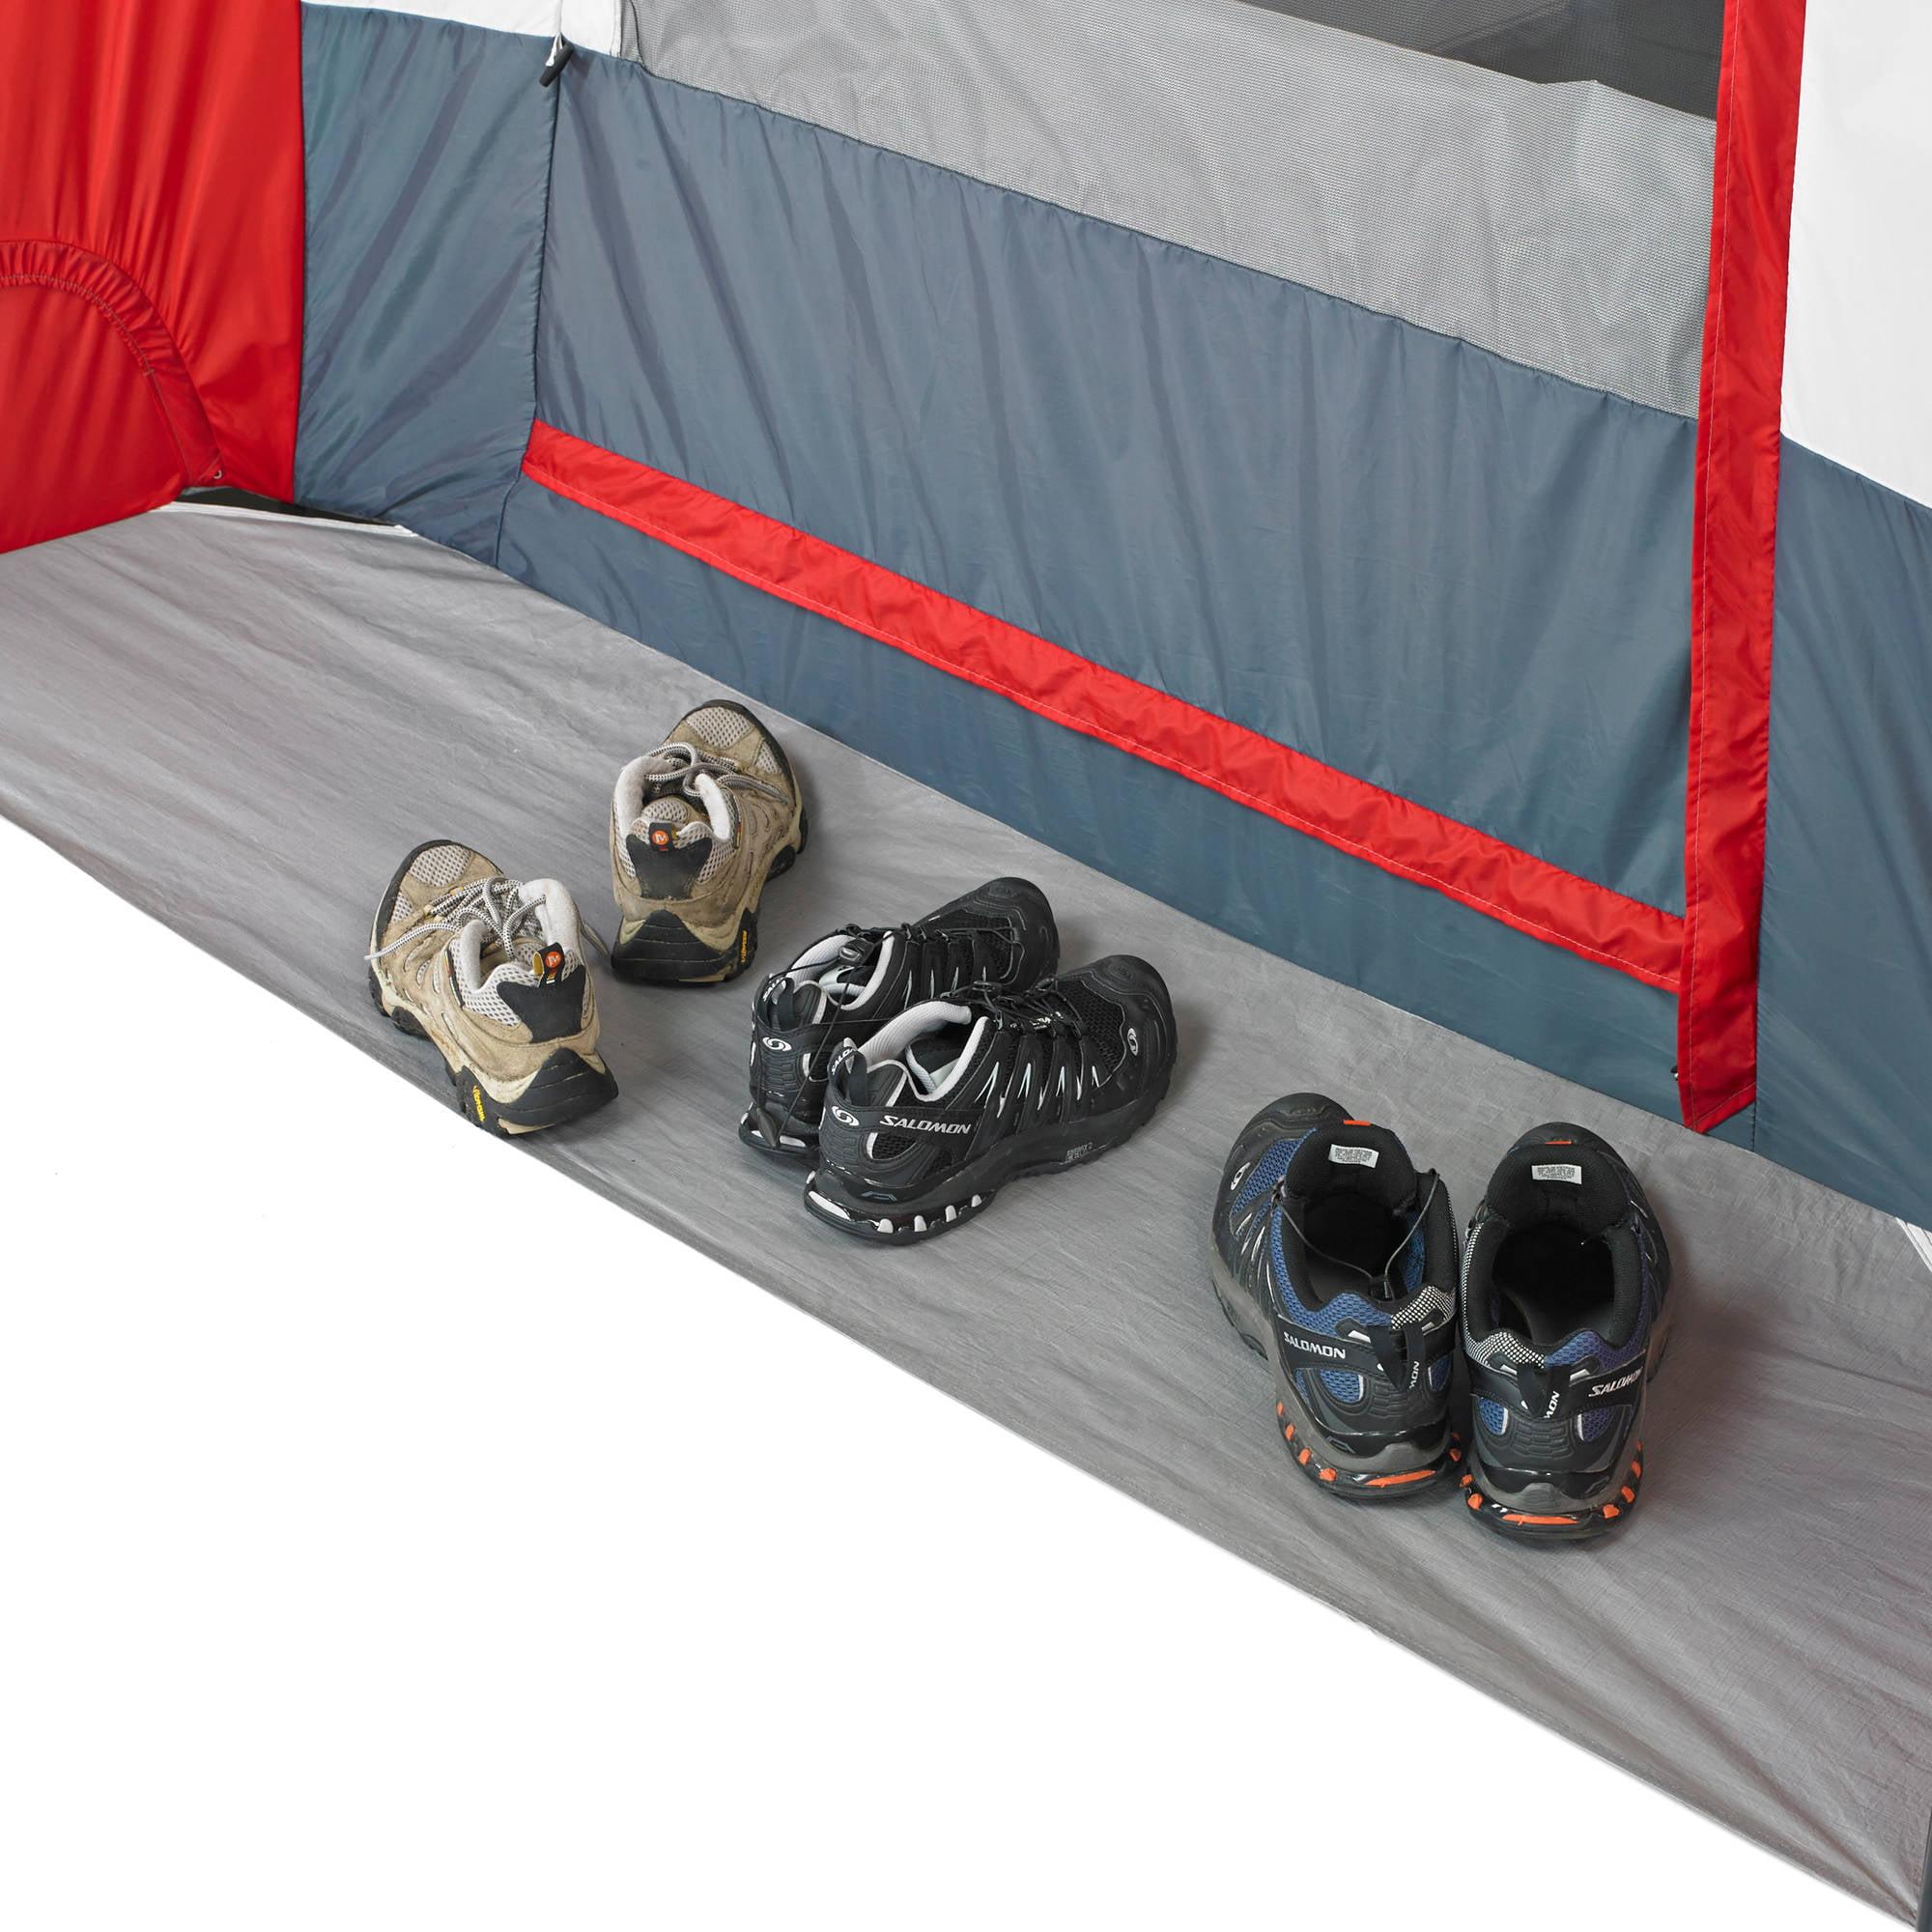 sc 1 st  Walmart & Ozark Trail 10-Person Cabin Tent - Walmart.com